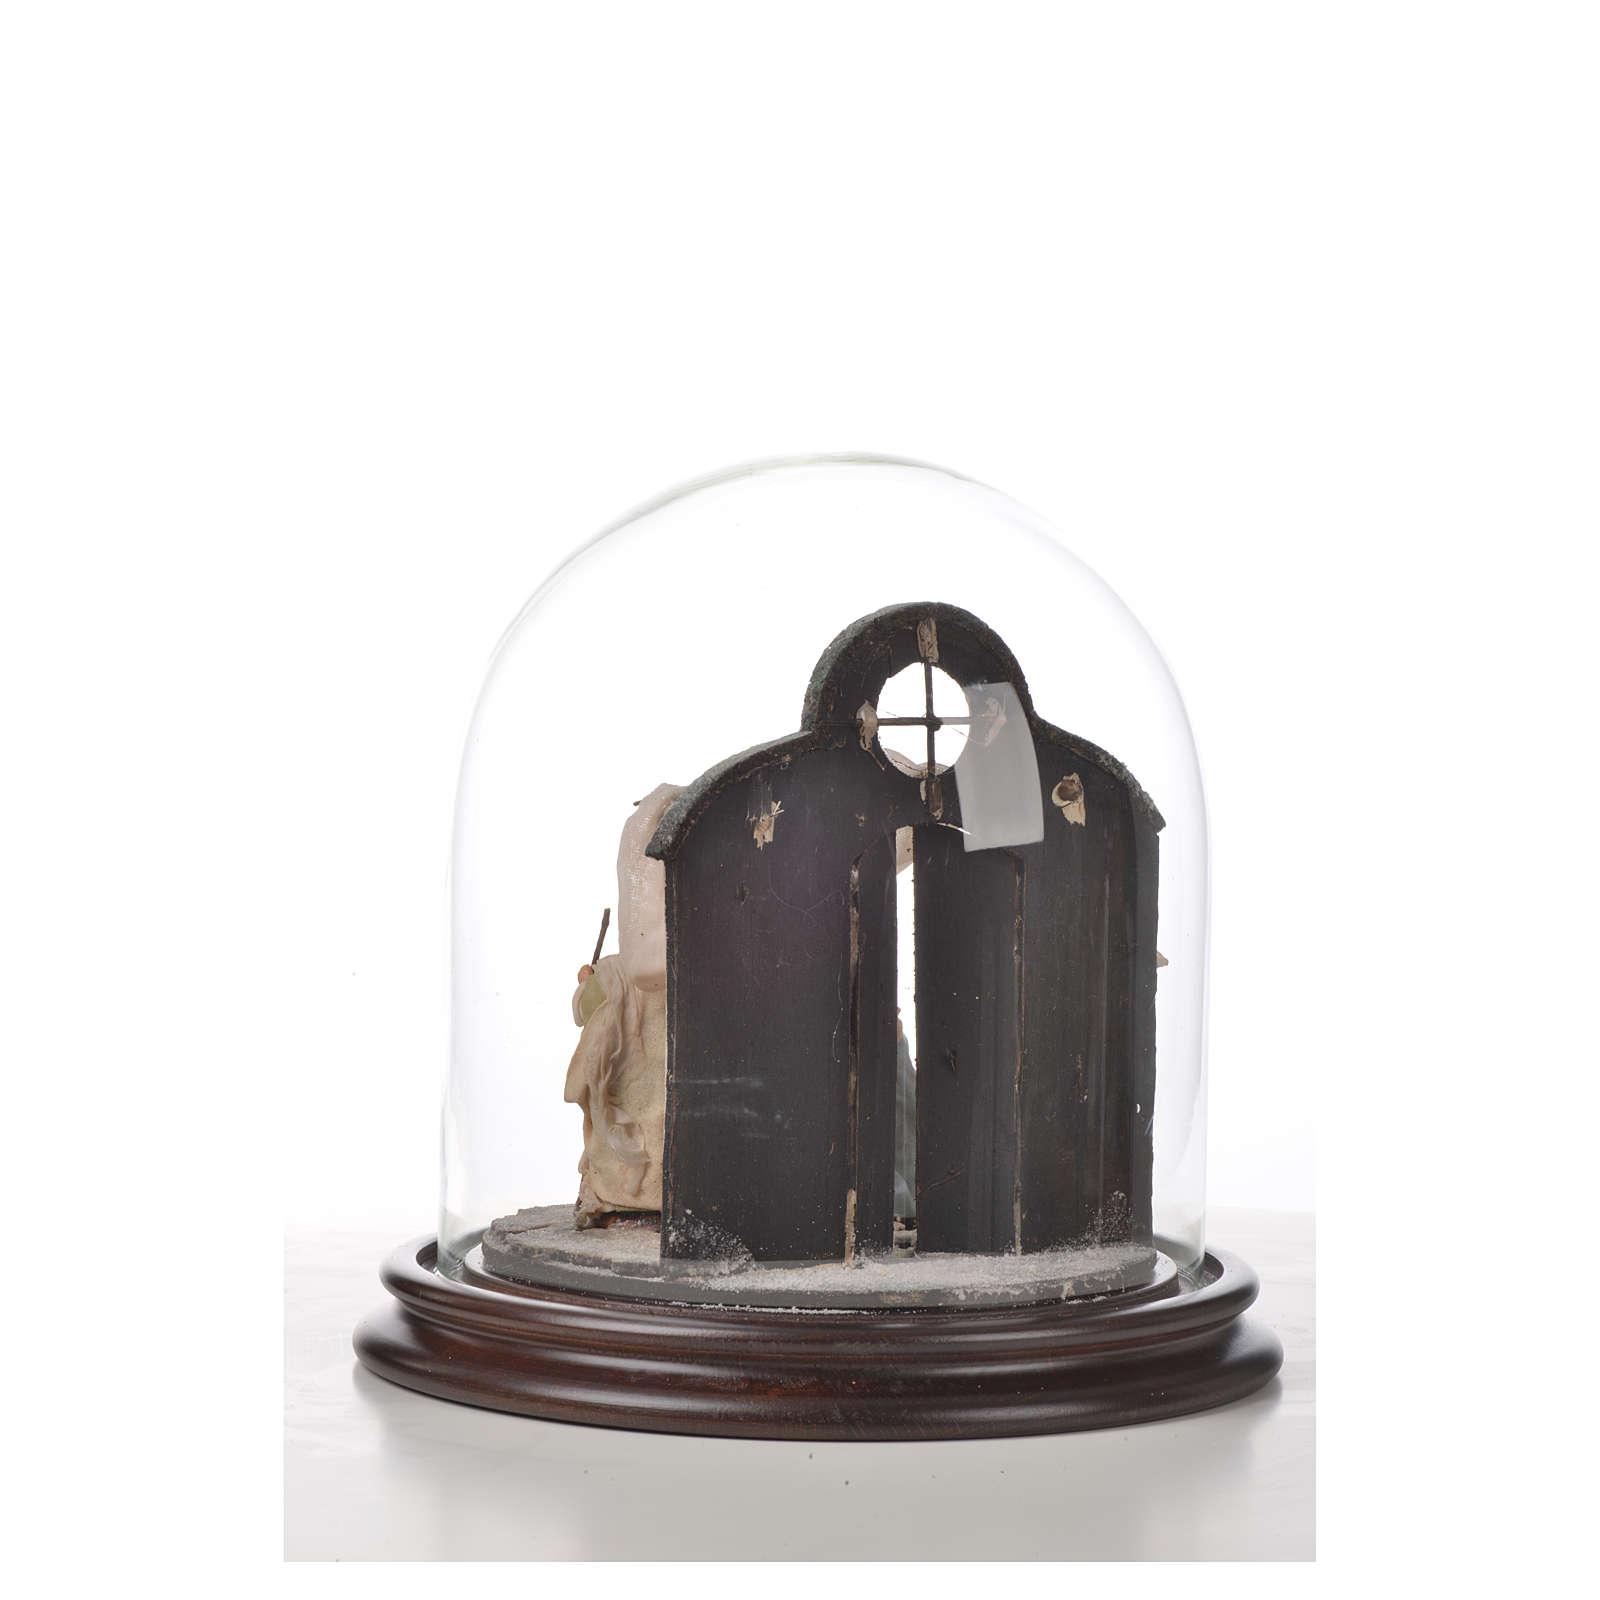 Natività Napoli terracotta stile arabo 20x20 cm campana di vetr 4